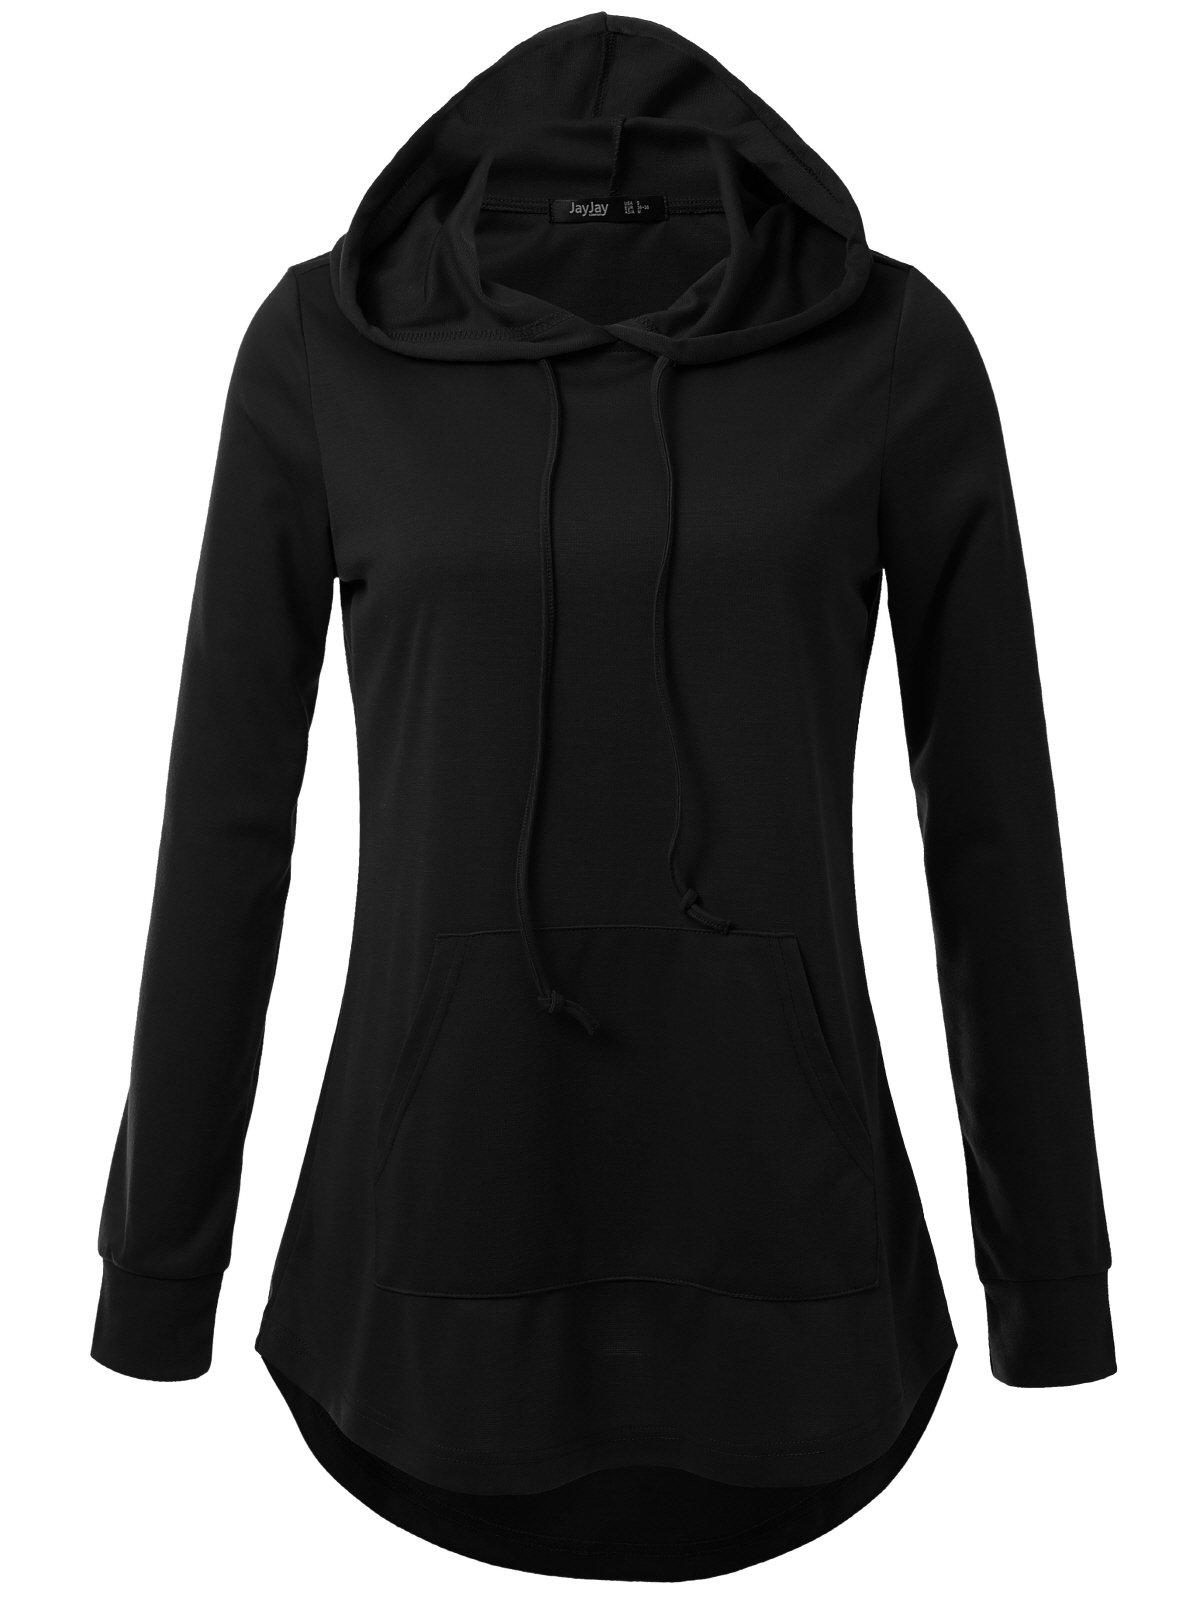 JayJay Women High Low Sweat Casual Long Sleeve Hoodie Lightweight Sweatshirt,Black,2XL by JayJay Active